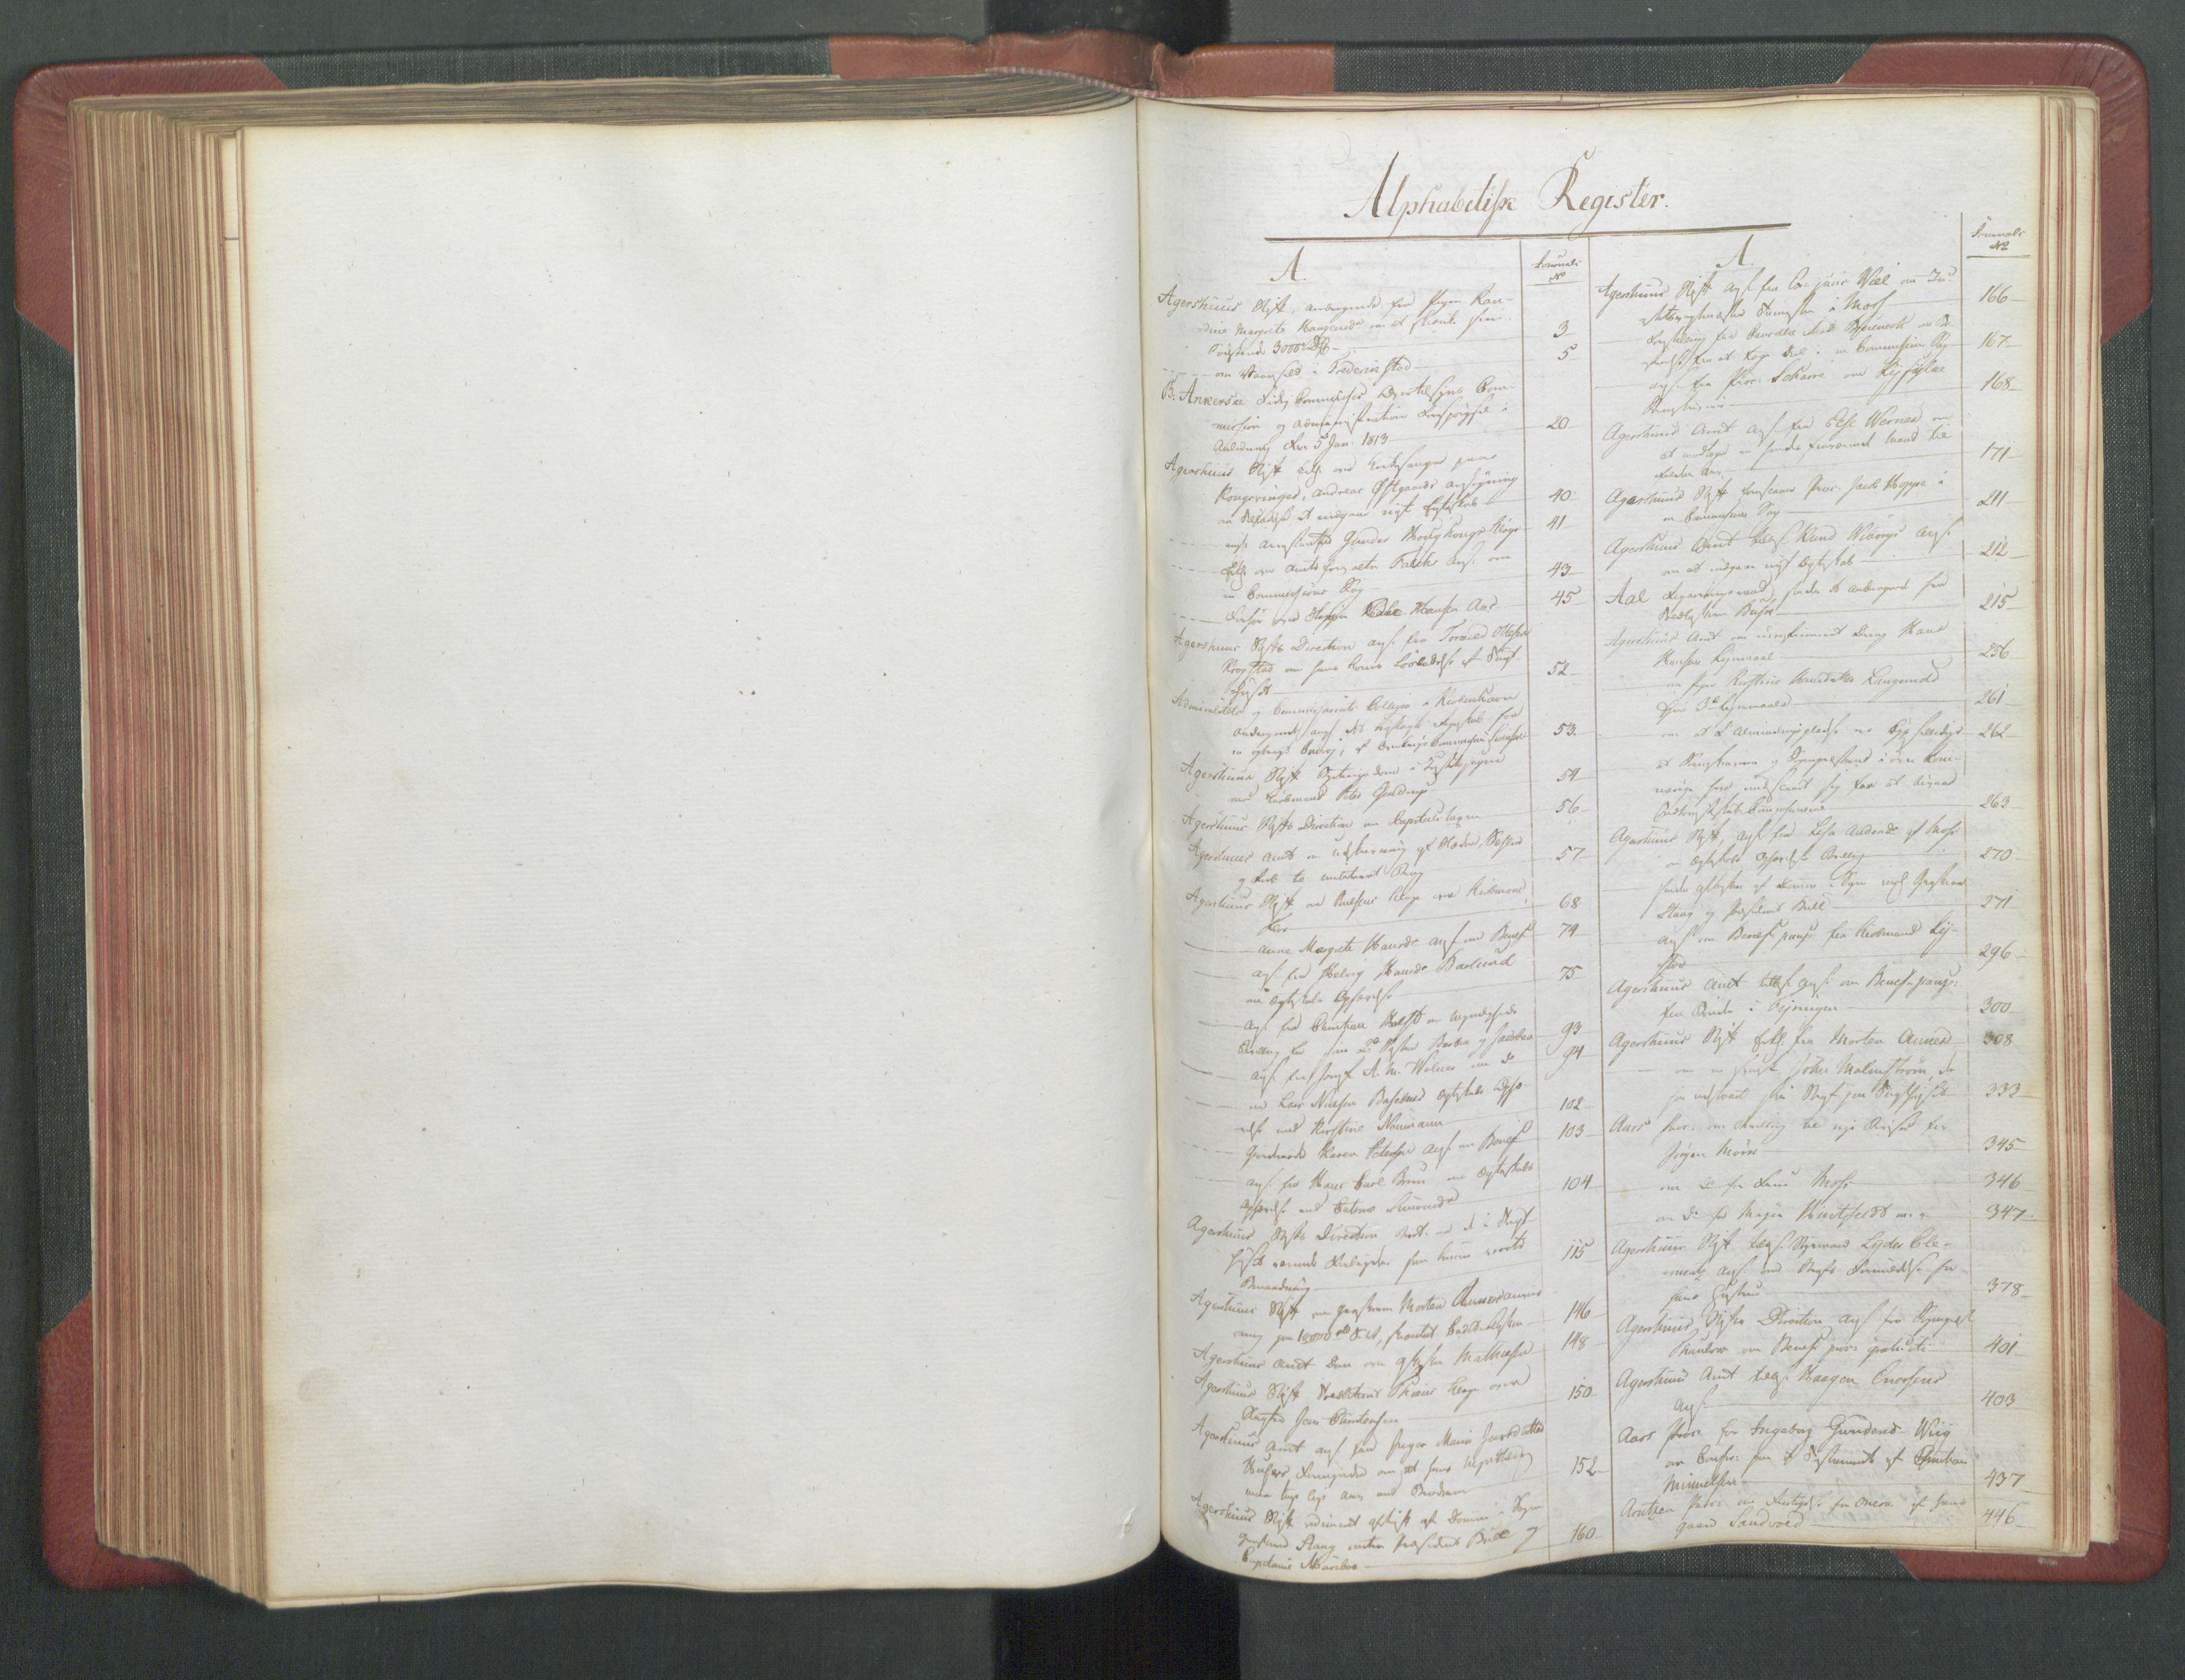 RA, Departementene i 1814, Fc/L0039: Journal A, 1814, s. 207